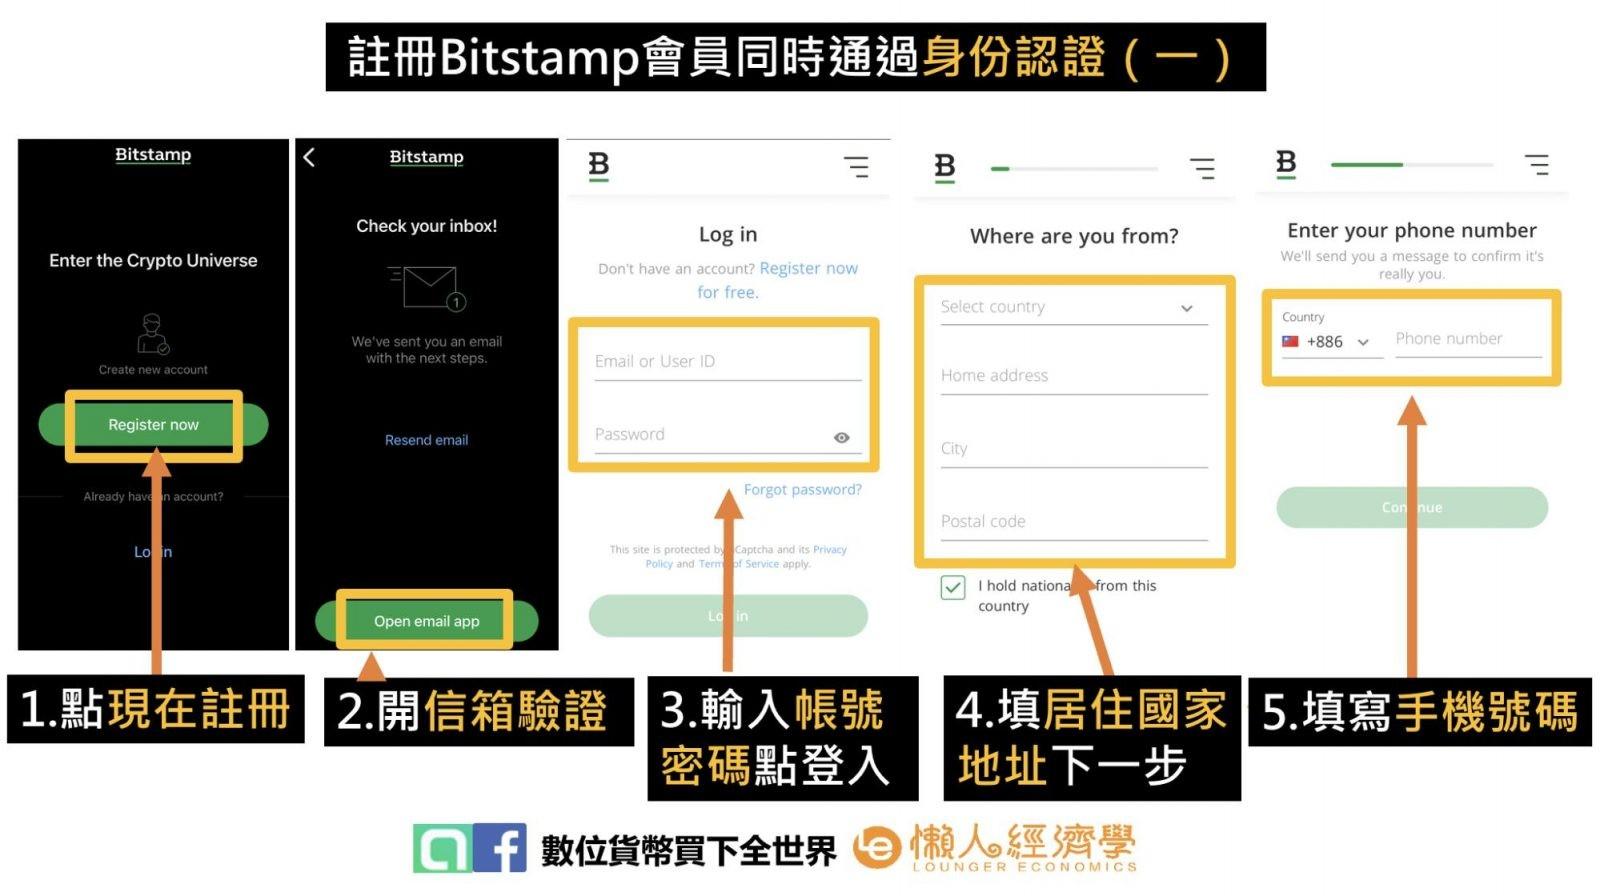 Bitstamp交易所註冊同時進行身份認證流程(一)